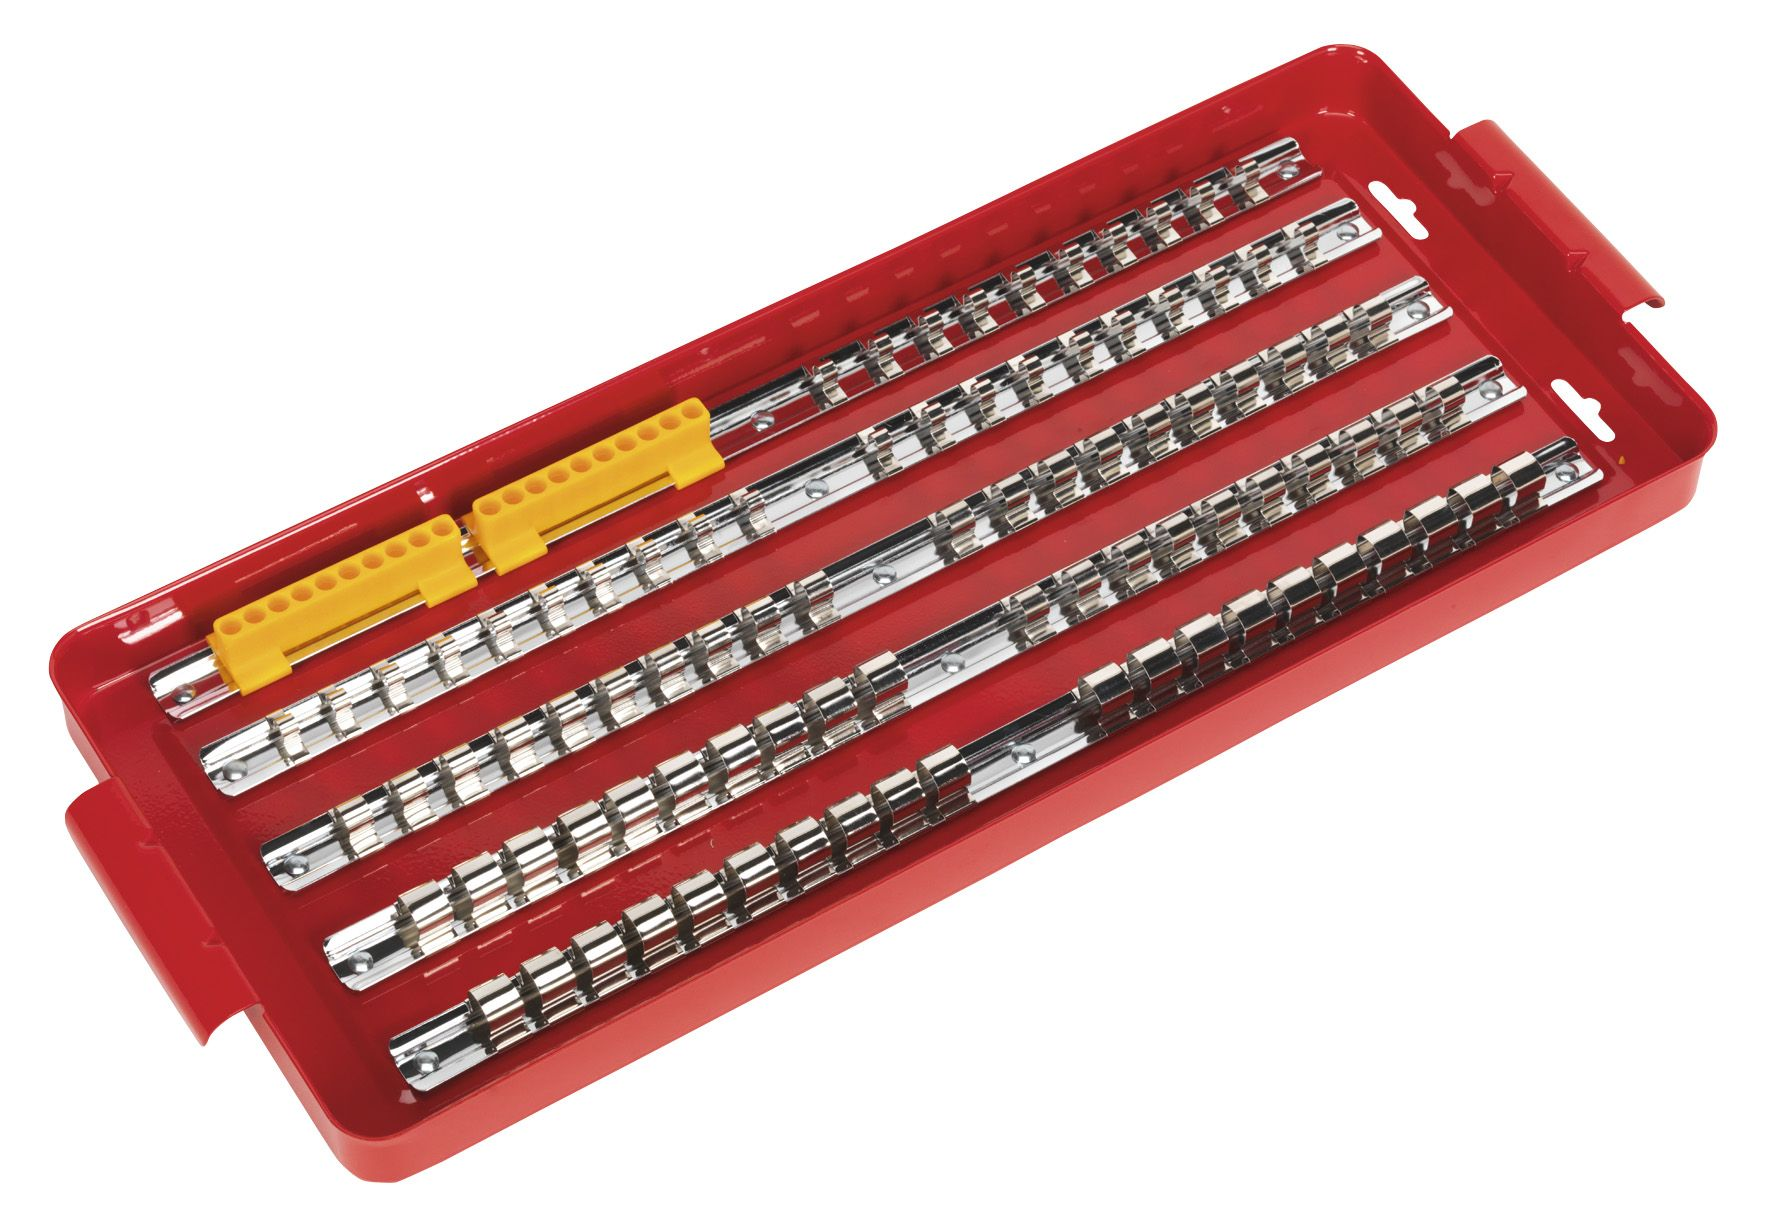 "Sealey Socket Rail Tray 1/4"", 3/8"" & 1/2""Sq Drive"